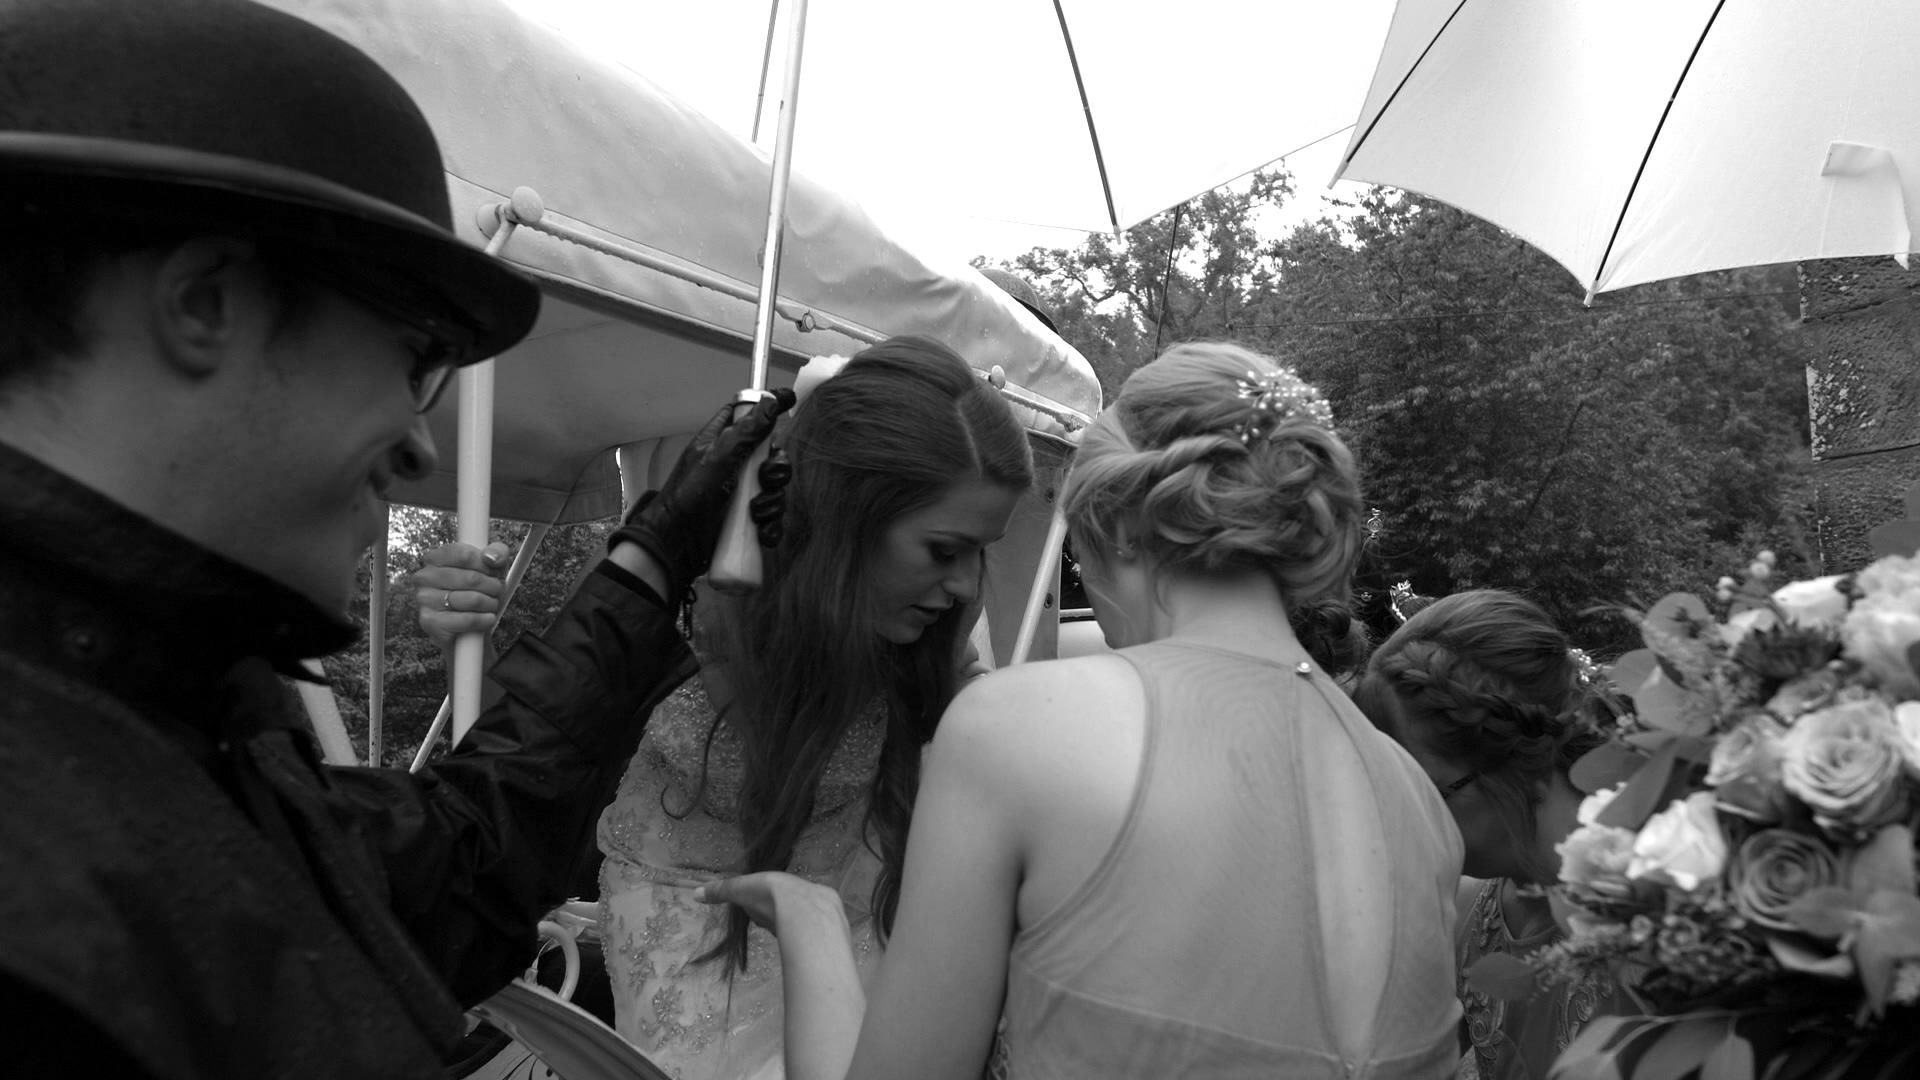 DRUMTOCHTY-SUMMER-WEDDING (08).jpg